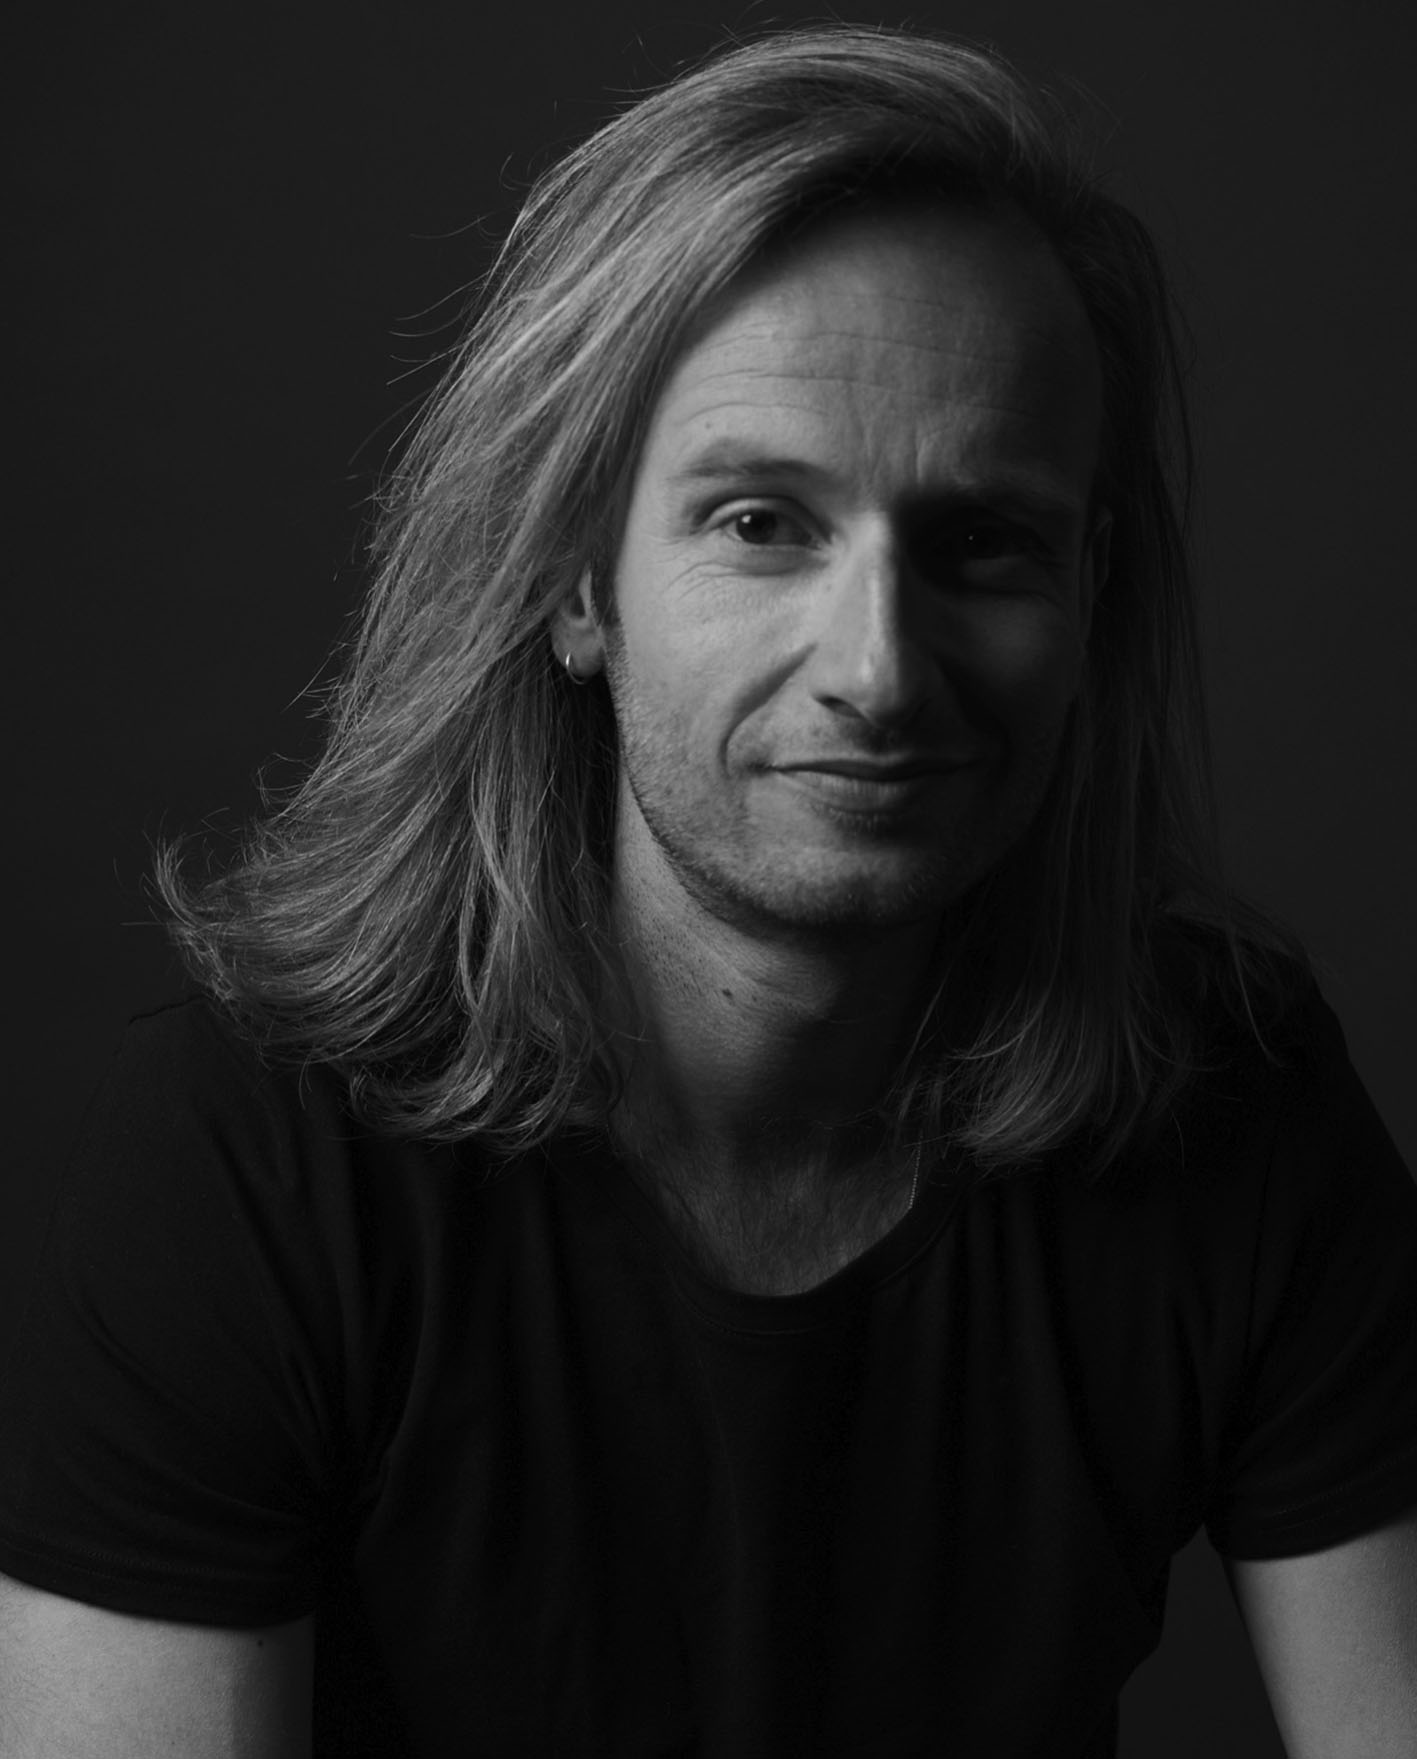 Fotograaf Steven Borghouts